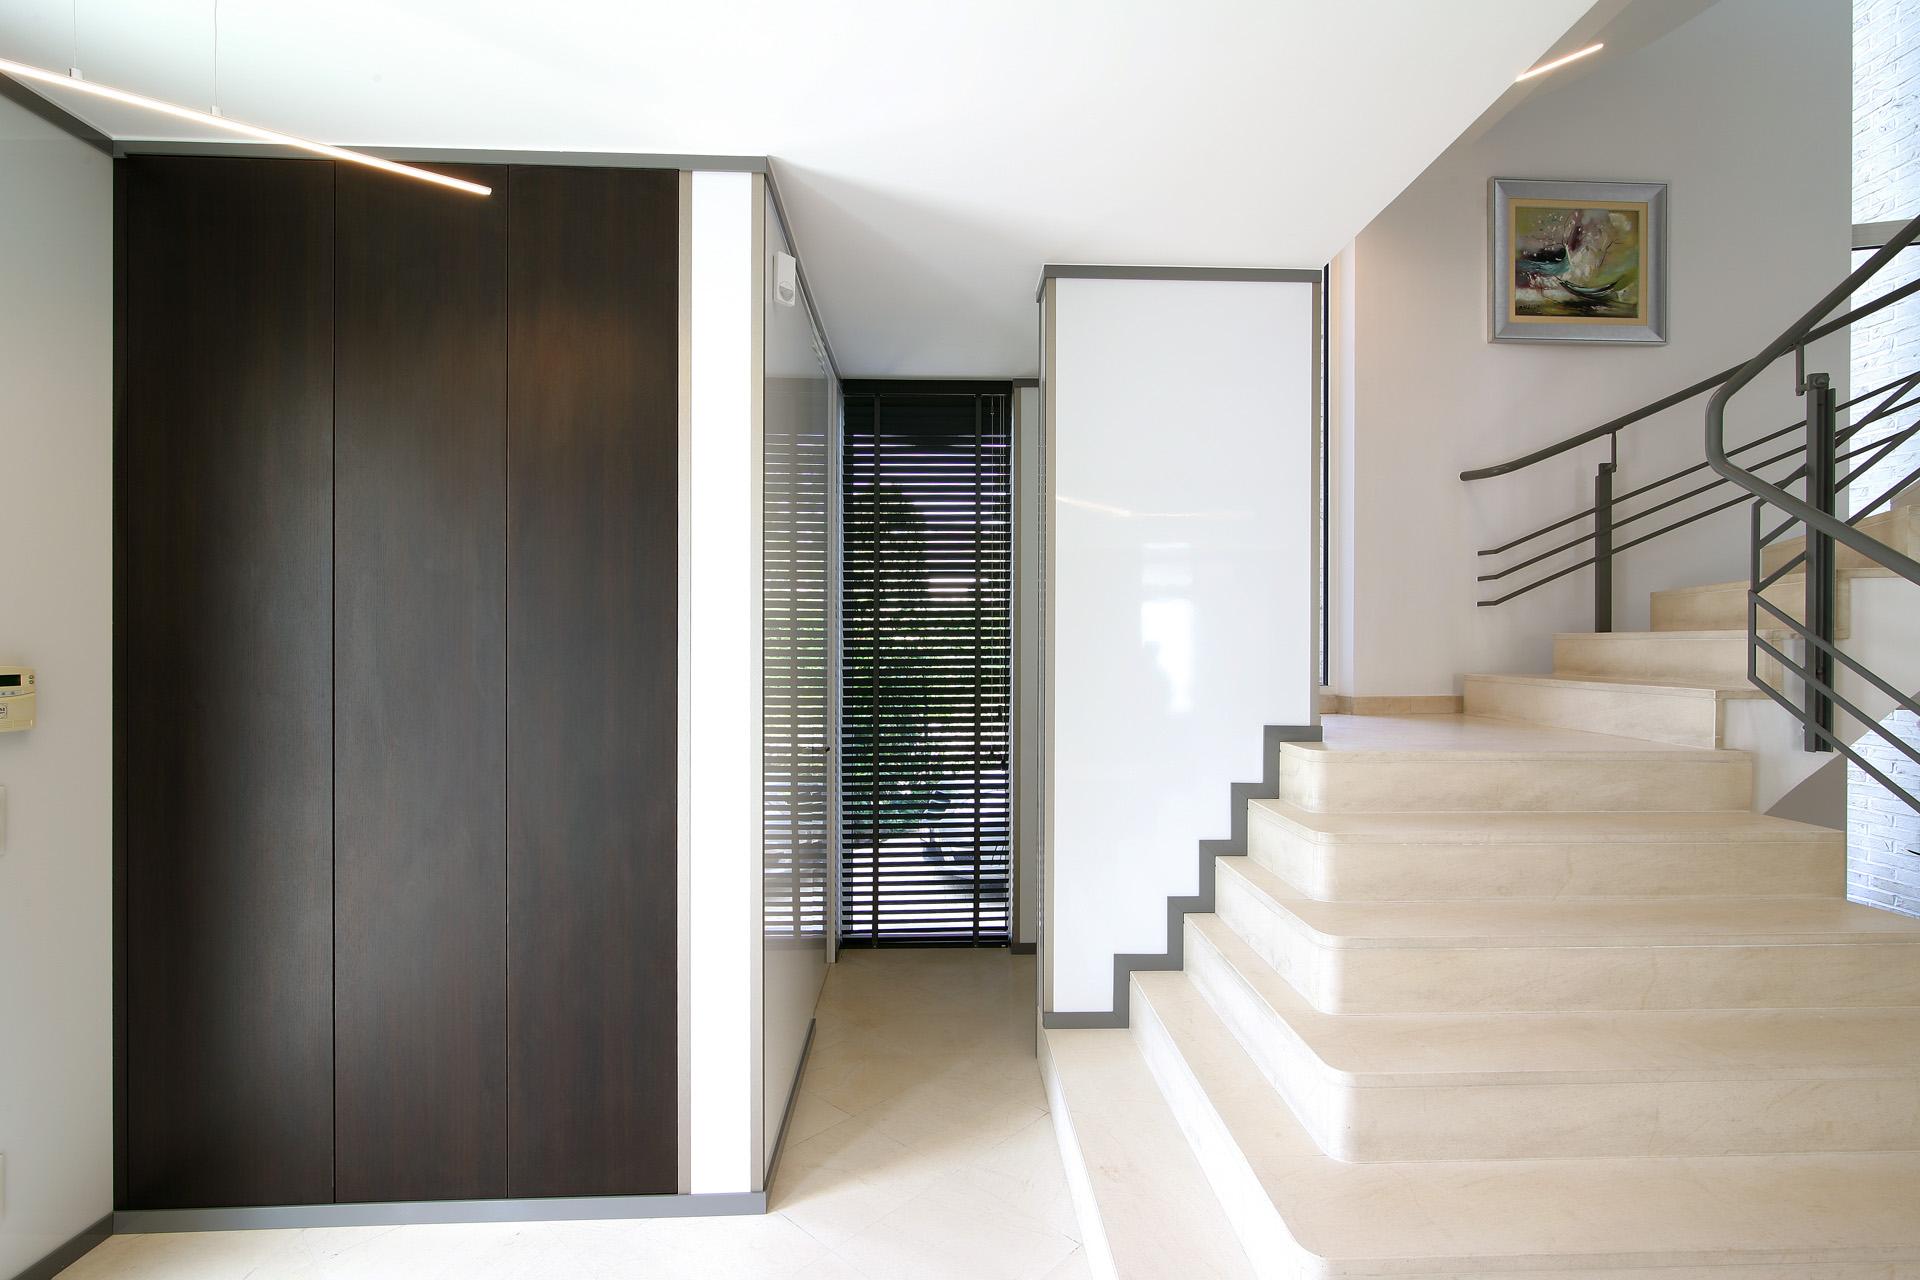 Marcotte Style – Exclusieve interieurinrichting, interieur op maat - Marcotte Style